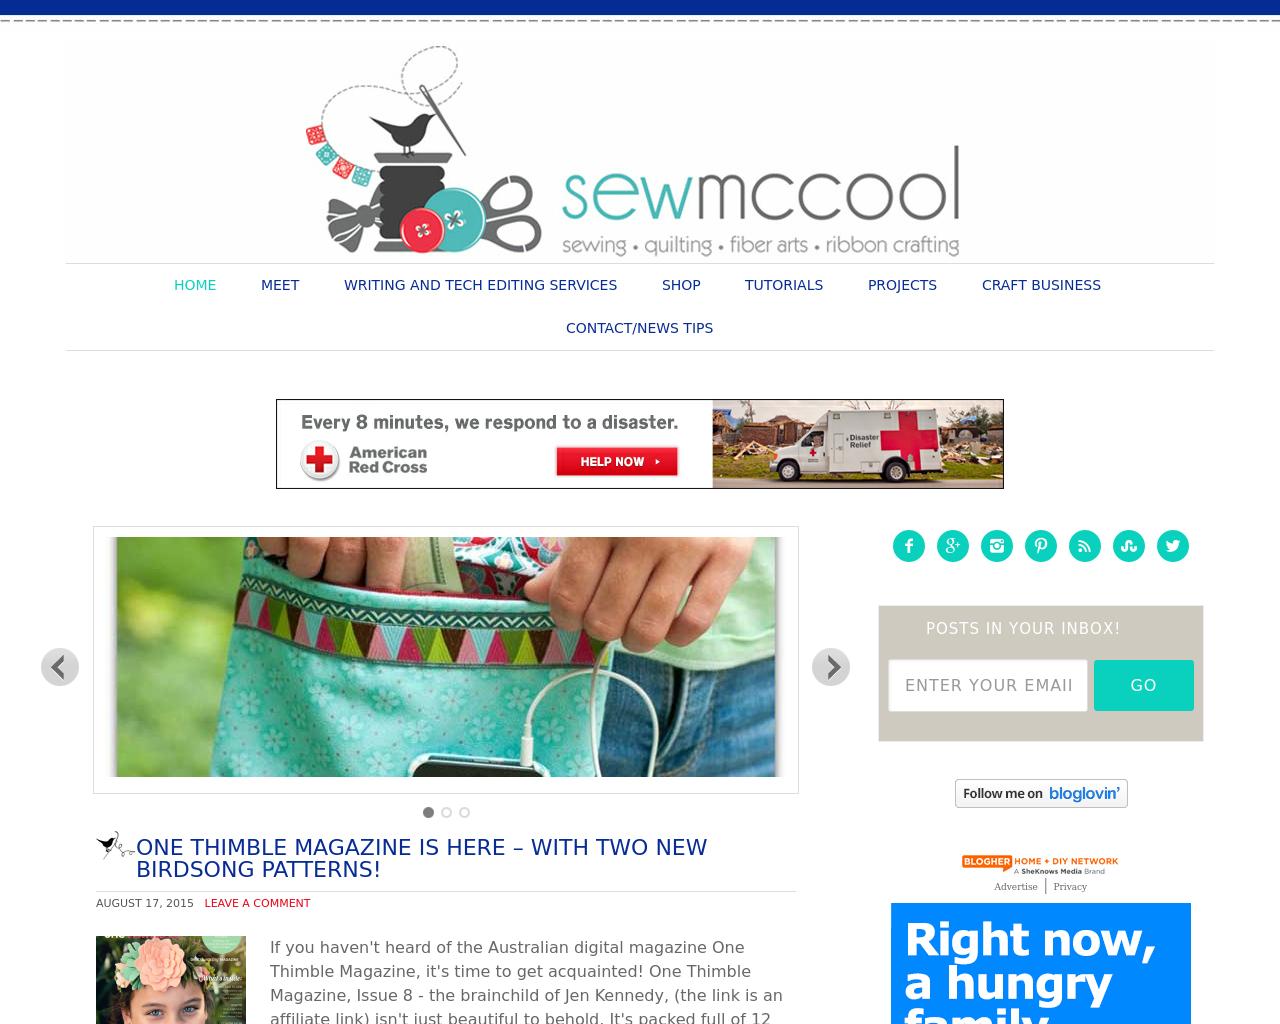 Sewmccool-Advertising-Reviews-Pricing